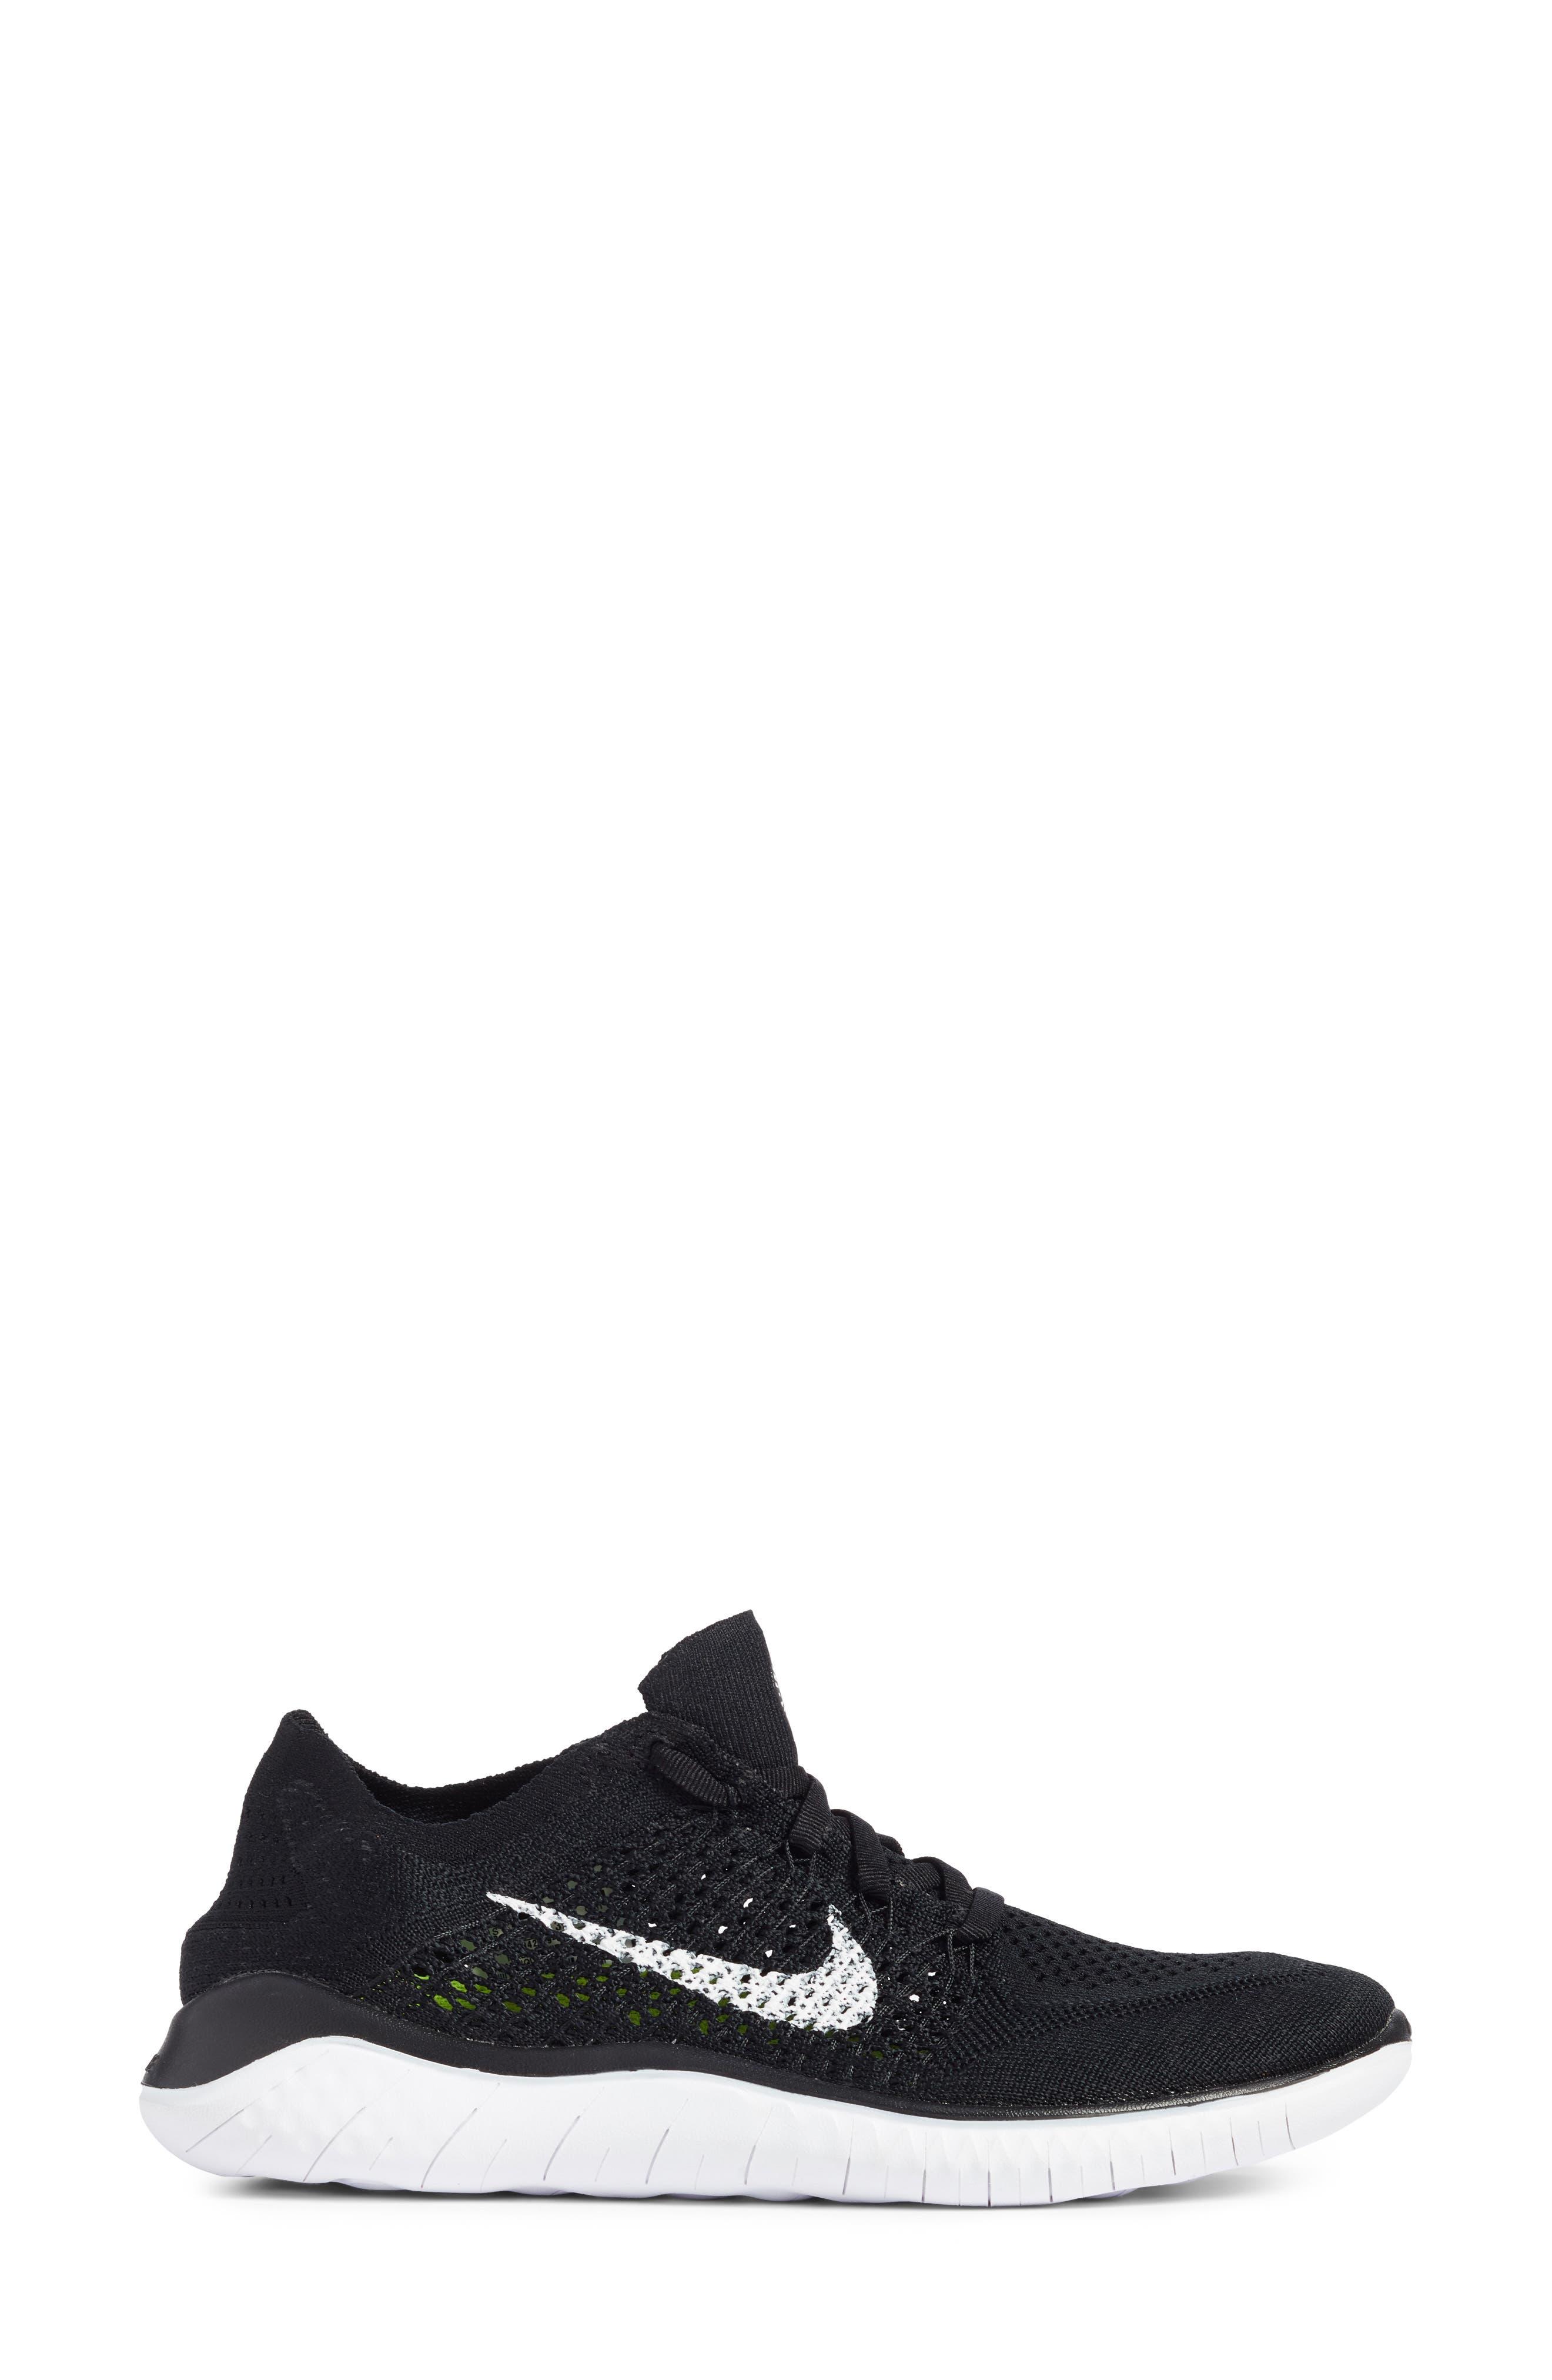 Alternate Image 3  - Nike Free RN Flyknit 2018 Running Shoe (Women)